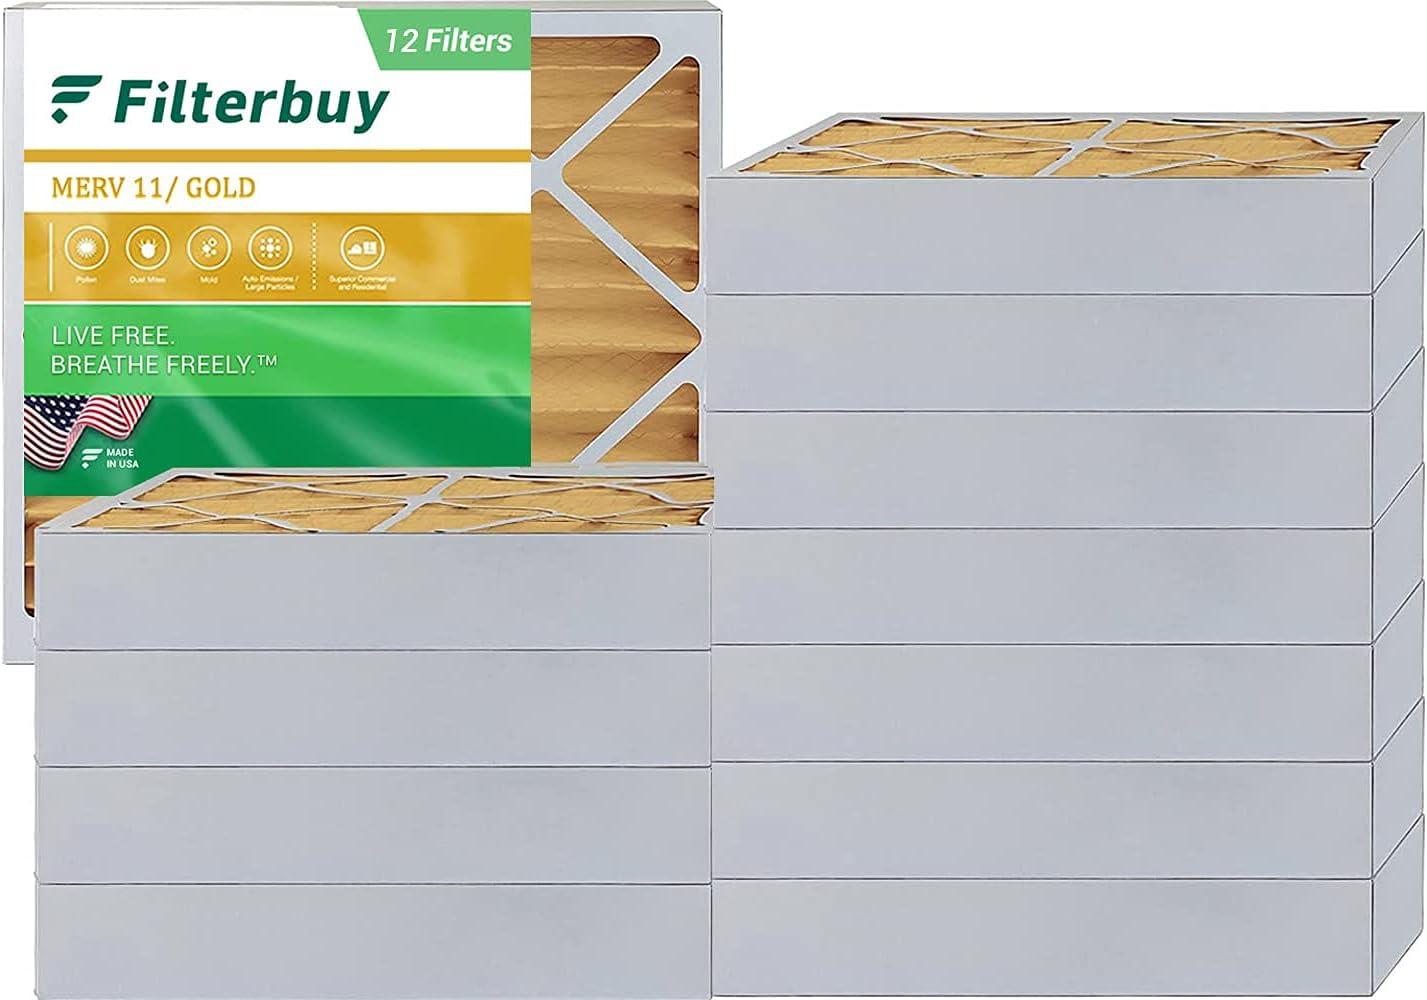 FilterBuy 16x16x4 MERV 11 Pleated HVAC AC Furnace Air Filter AFB Gold